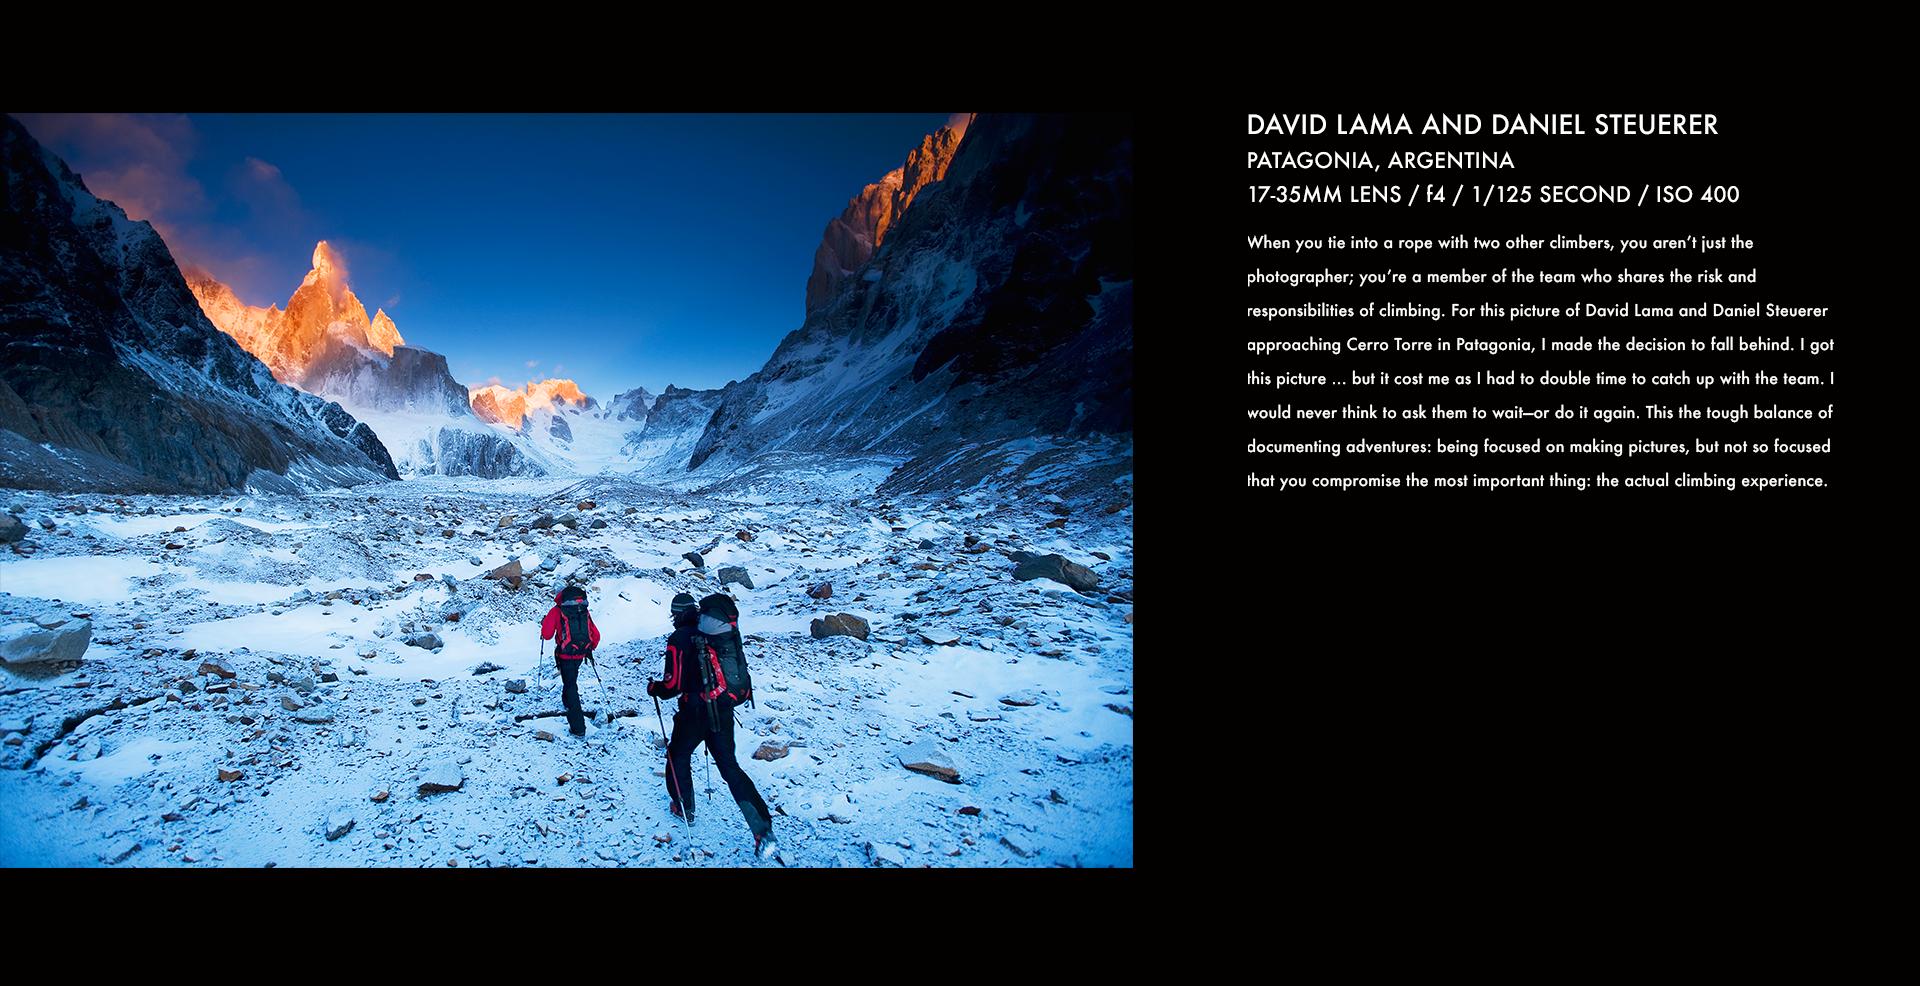 David Lama, Daniel Steuerer, Patagonia, climbing, mountain climbing, climbers, snow, golden hour, stories behind the images, corey rich